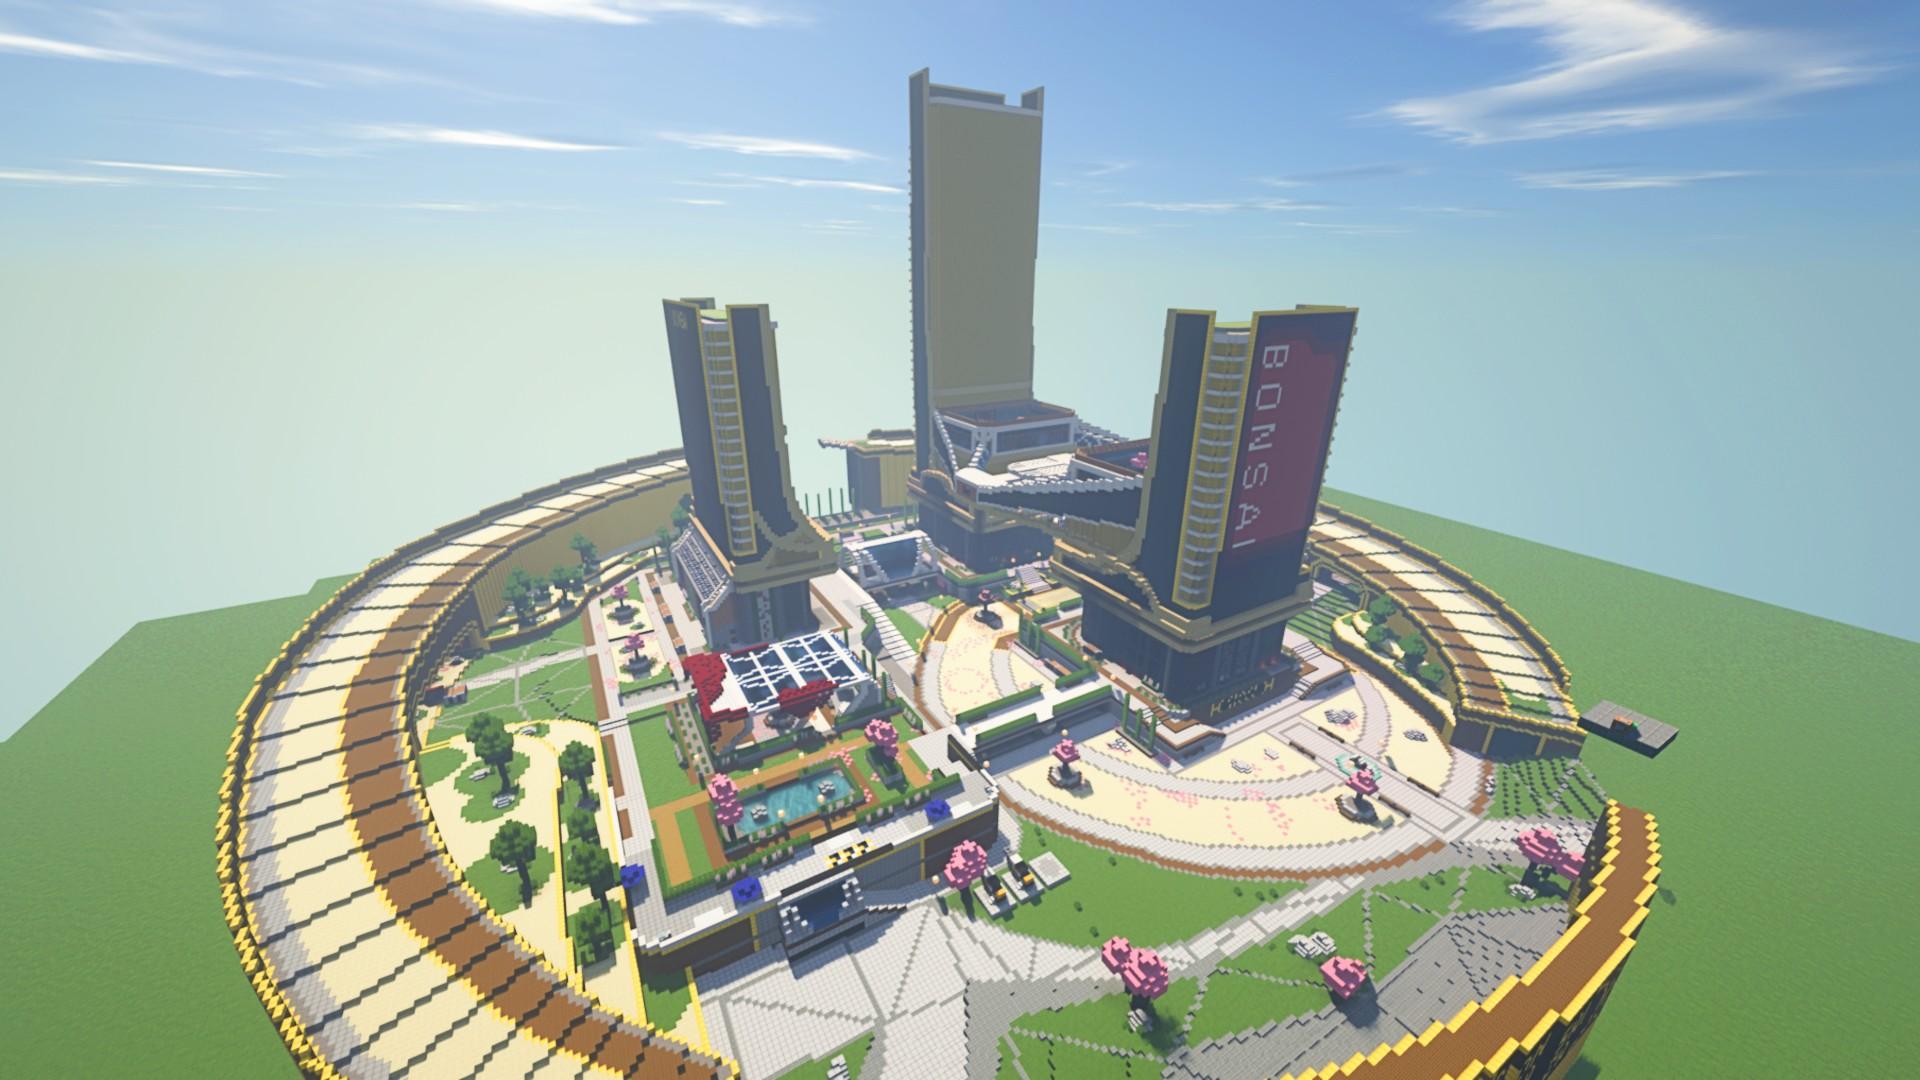 Apex Legends fan spends two months rebuilding Bonzai Plaza in Minecraft